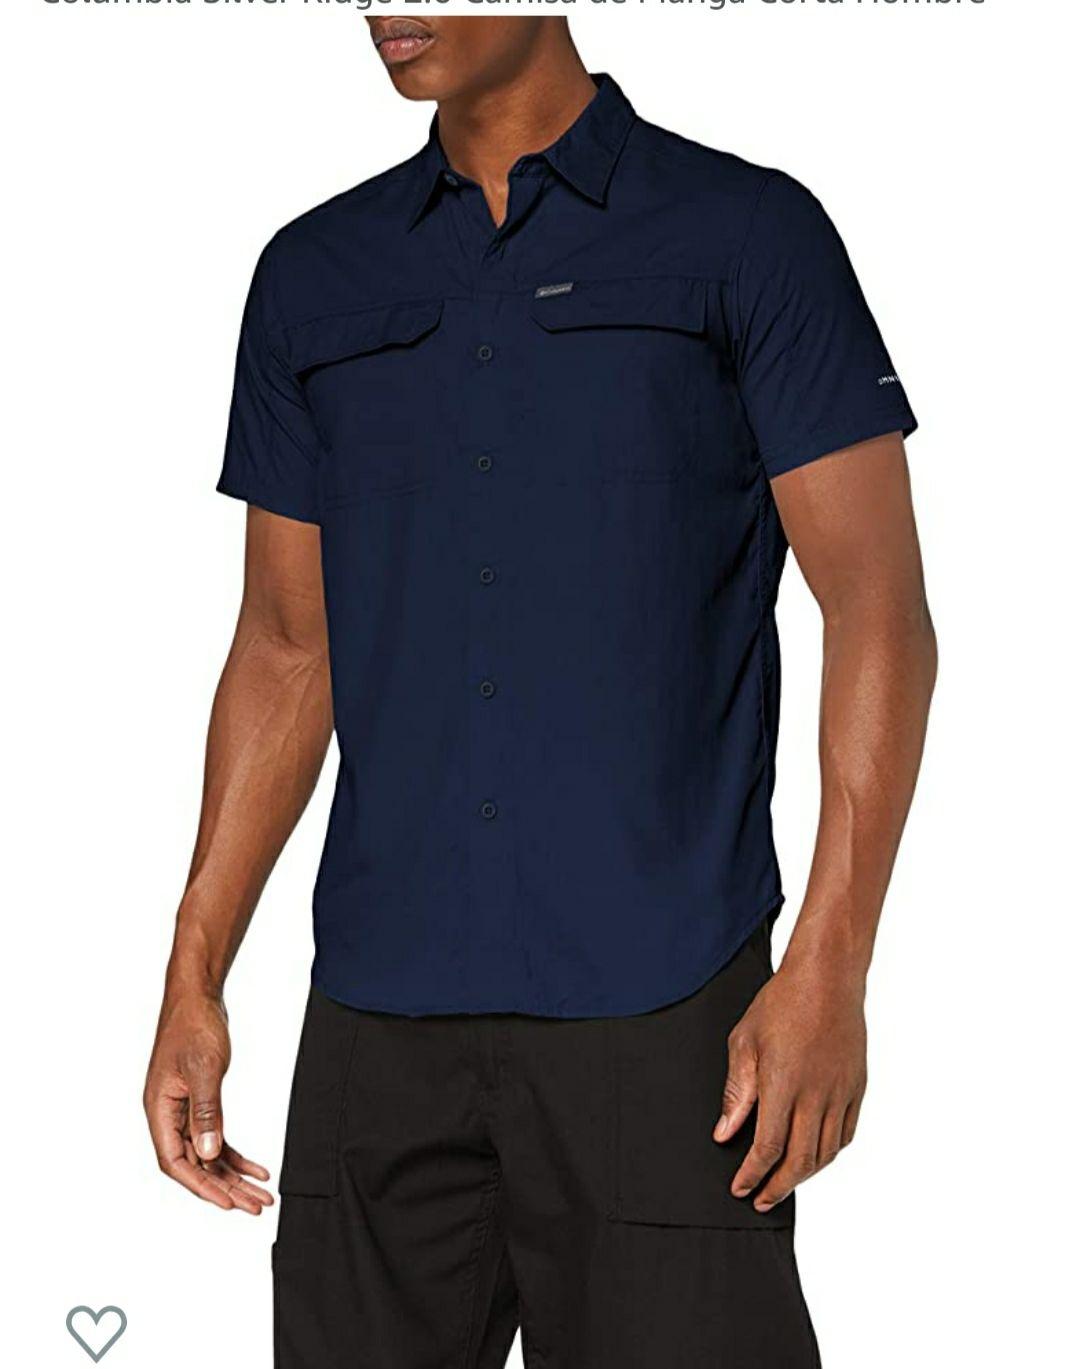 Camiseta de manga corta Columbia Silver Ridge 2.0 para hombre